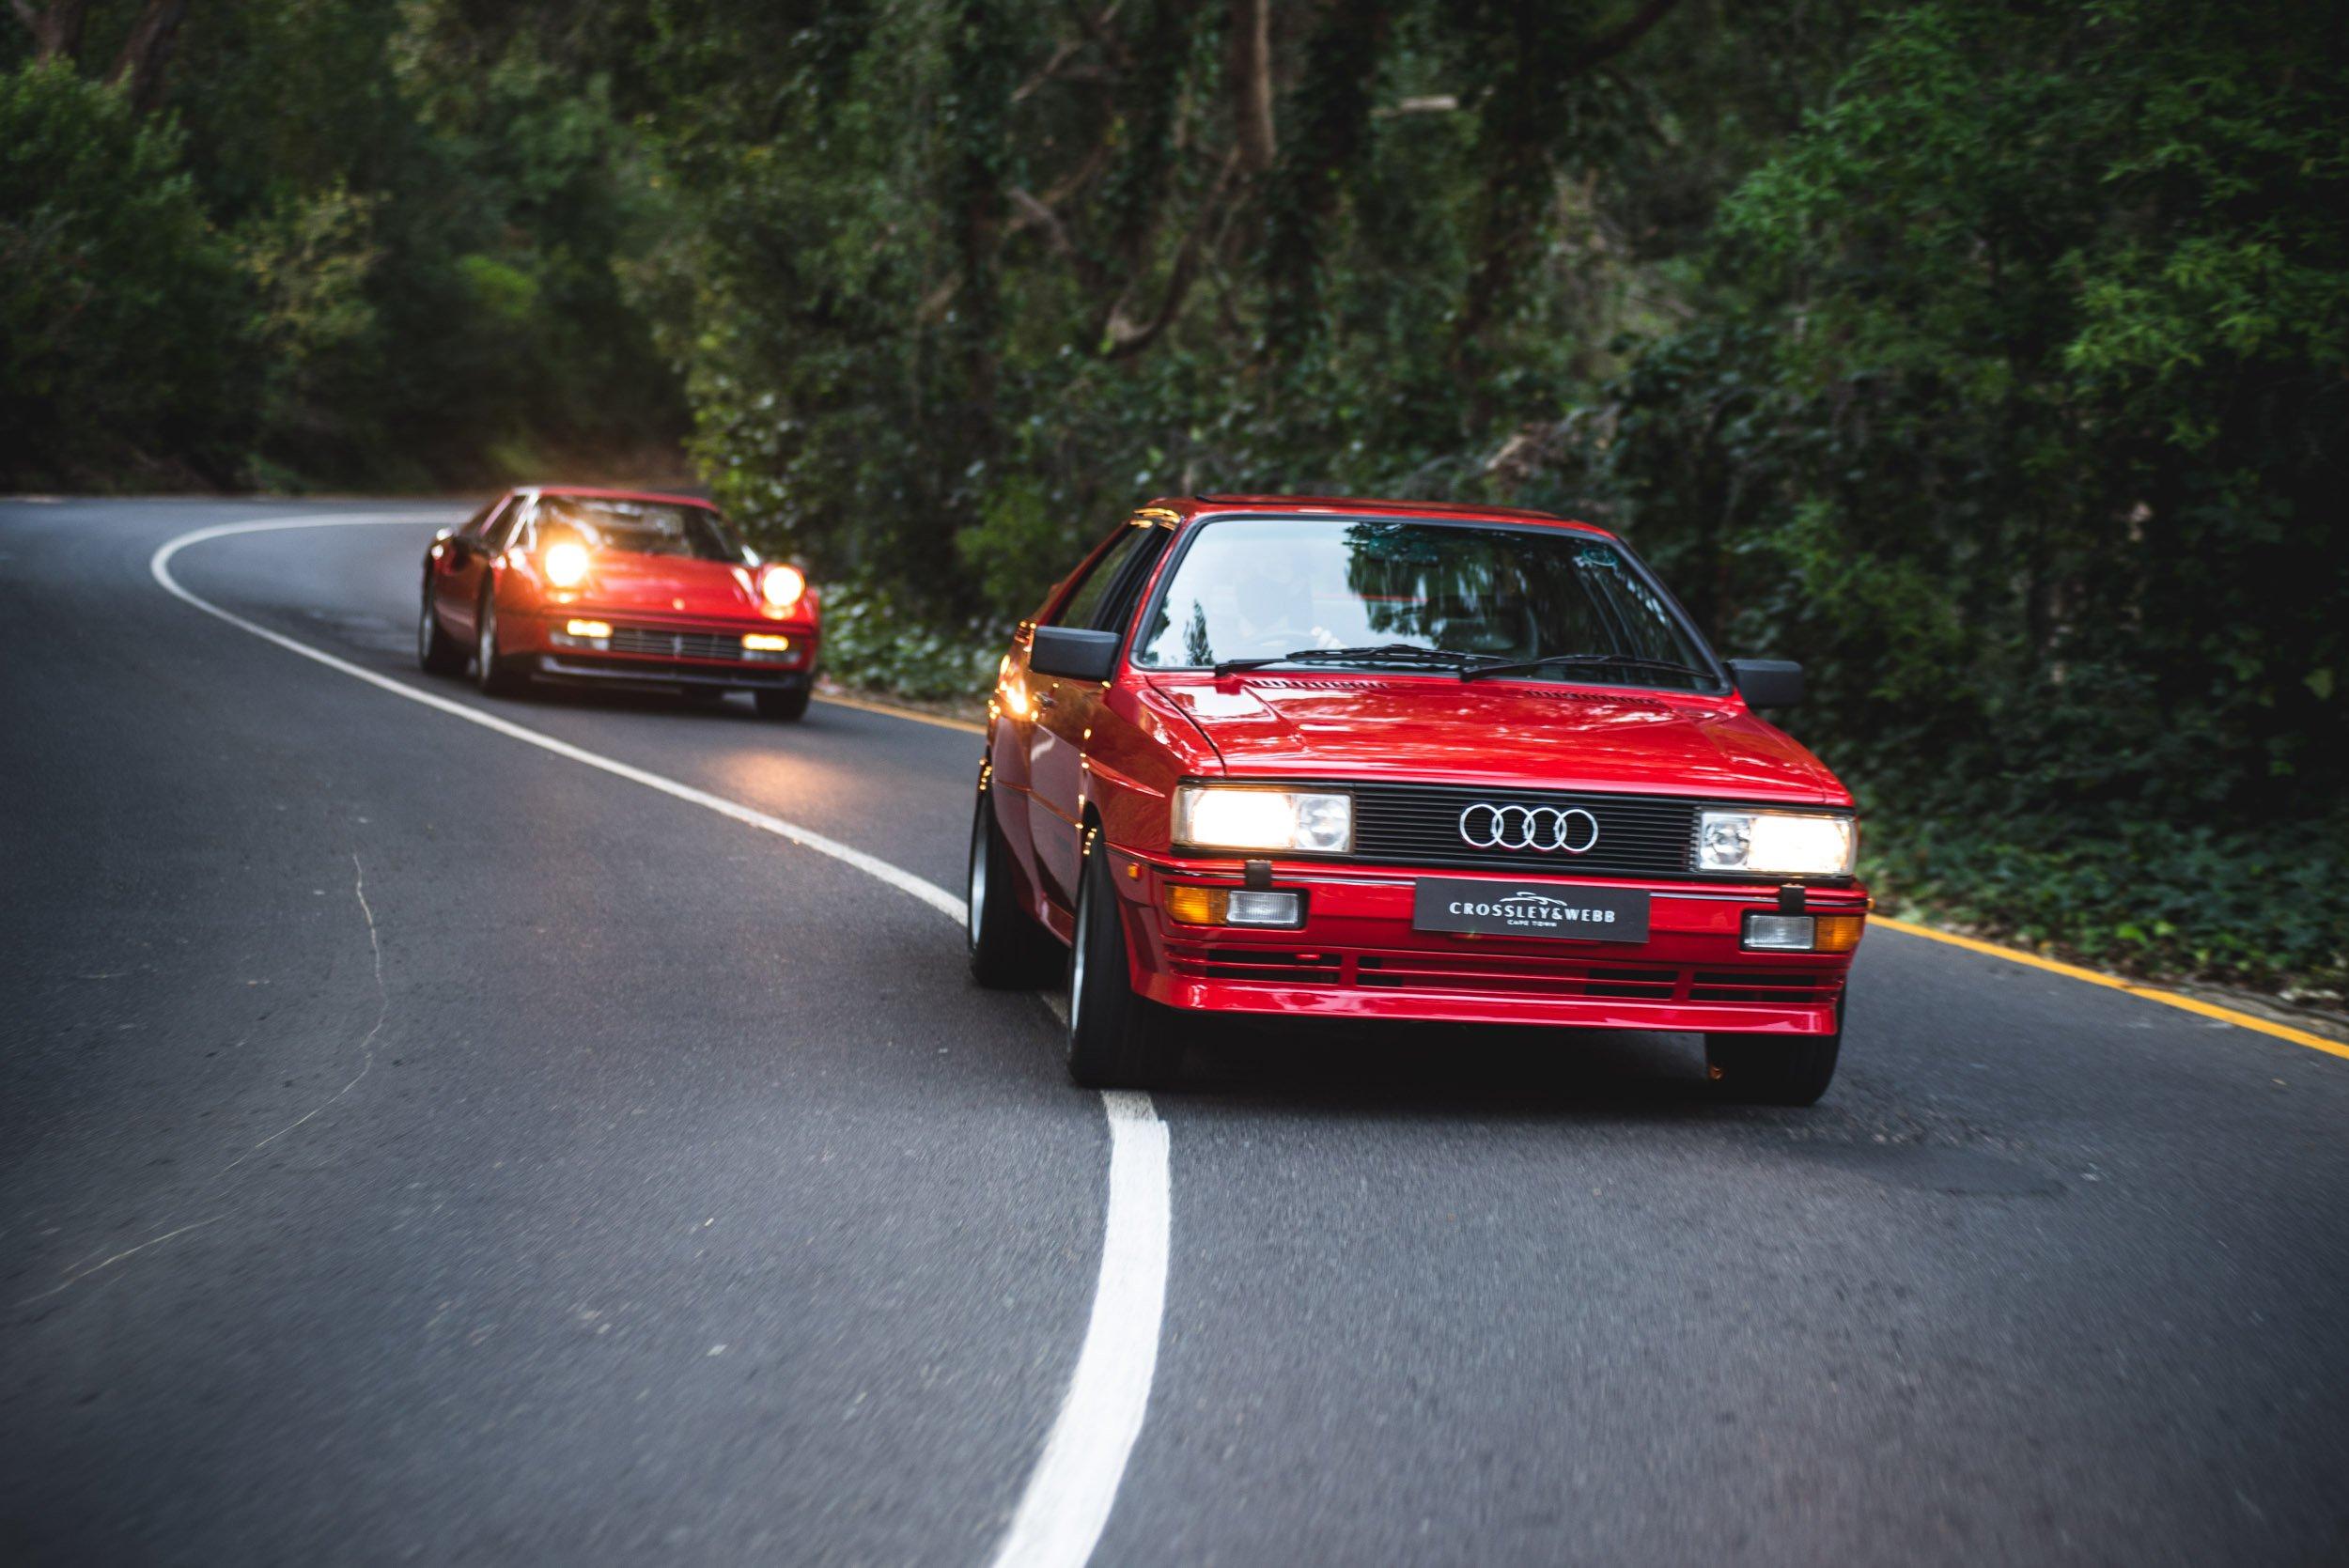 European Classics, Modern Classics & Supercars